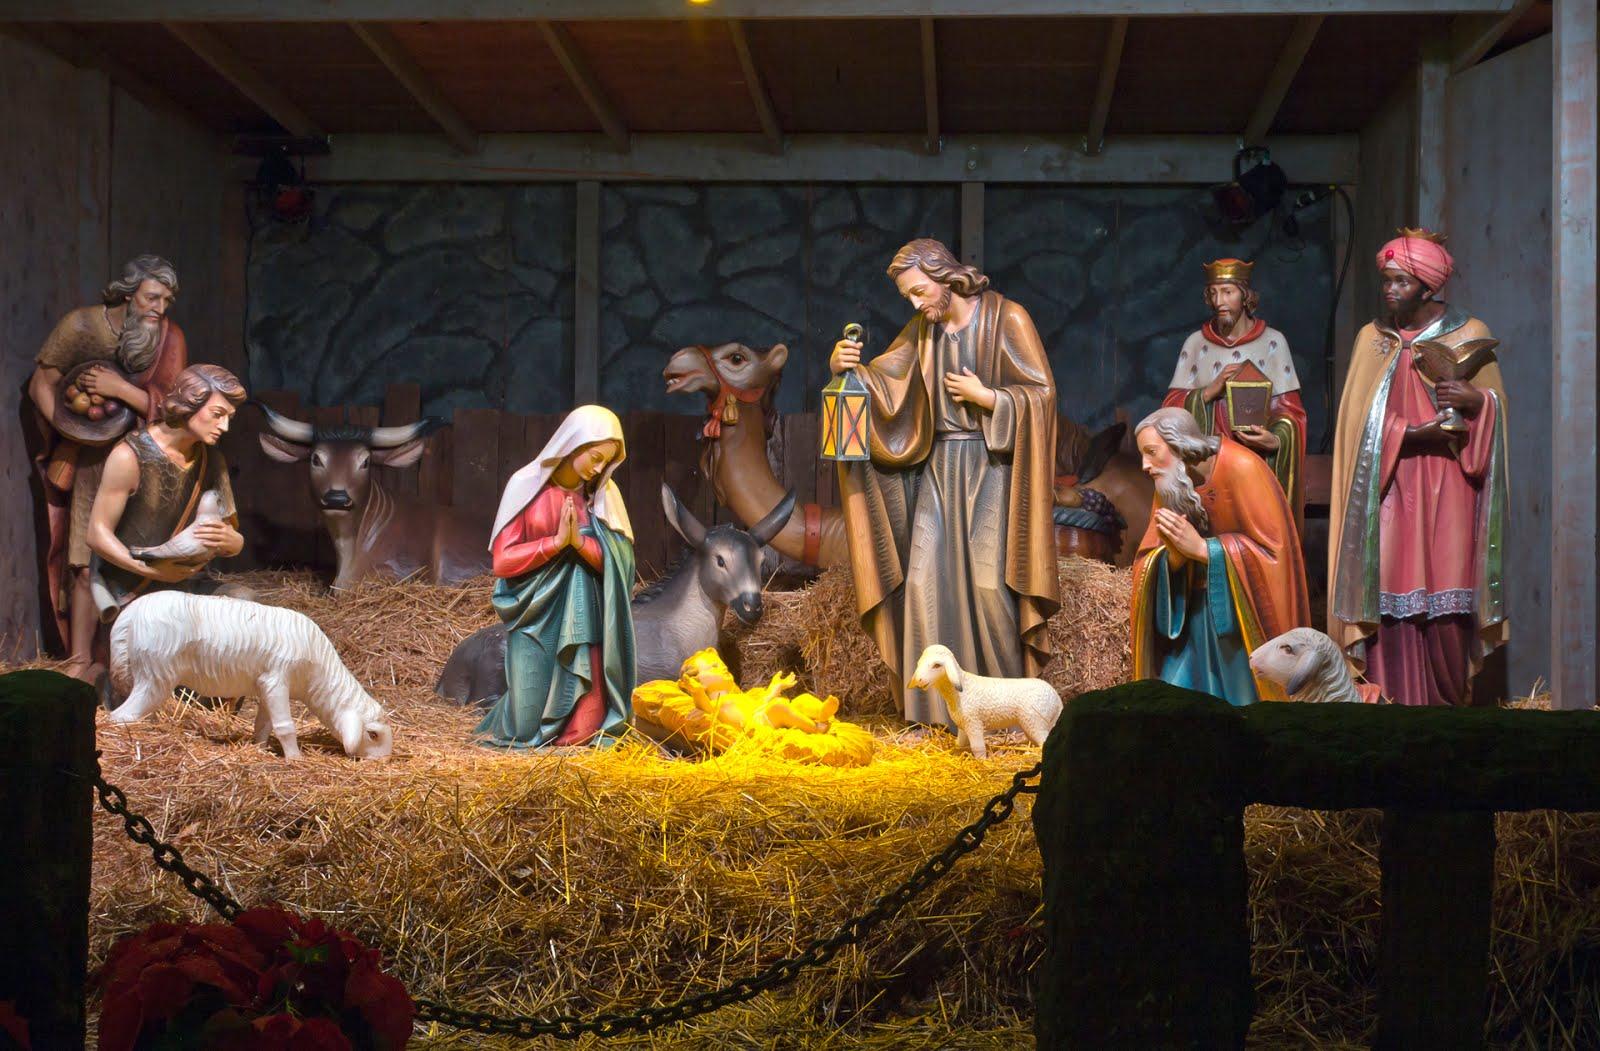 nacimiento-de-jesus-representacion-natividad-merry-christmas-pesebre ...